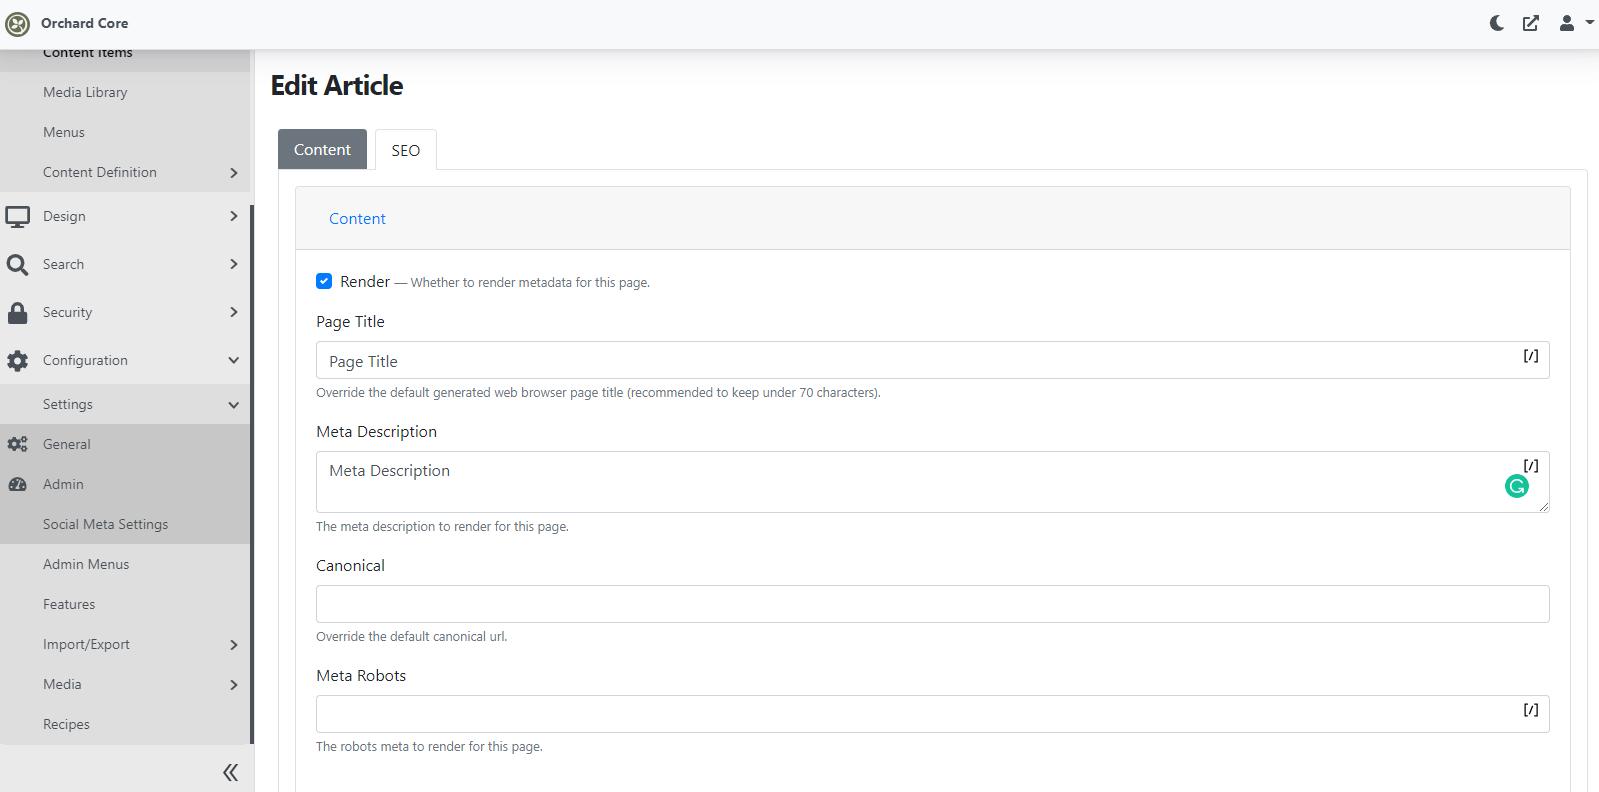 Content item specific SEO settings